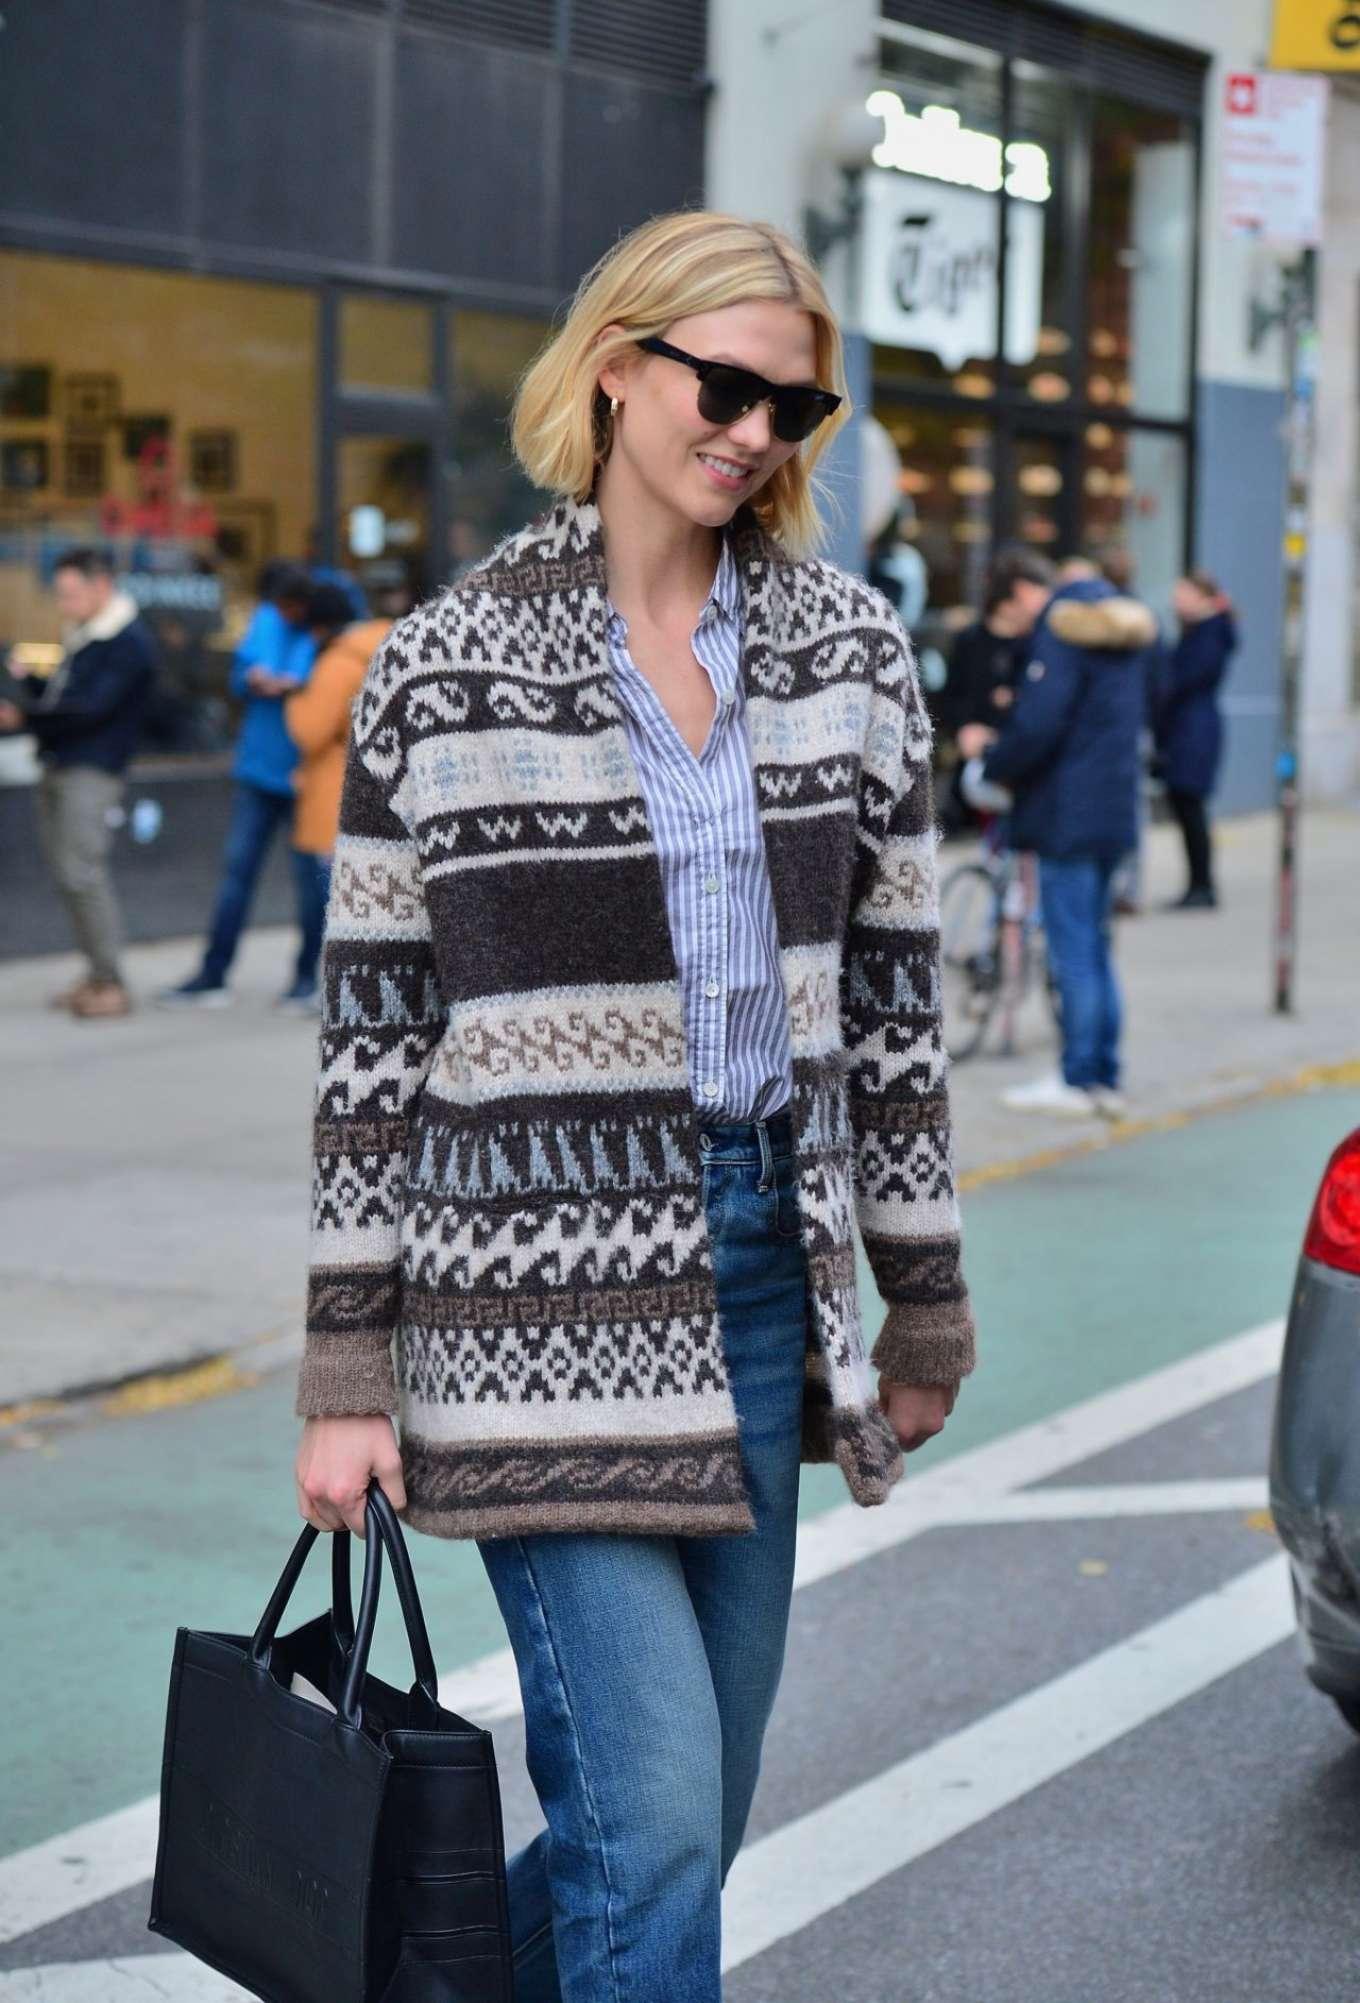 Karlie Kloss 2019 : Karlie Kloss – Street Style out NYC -01